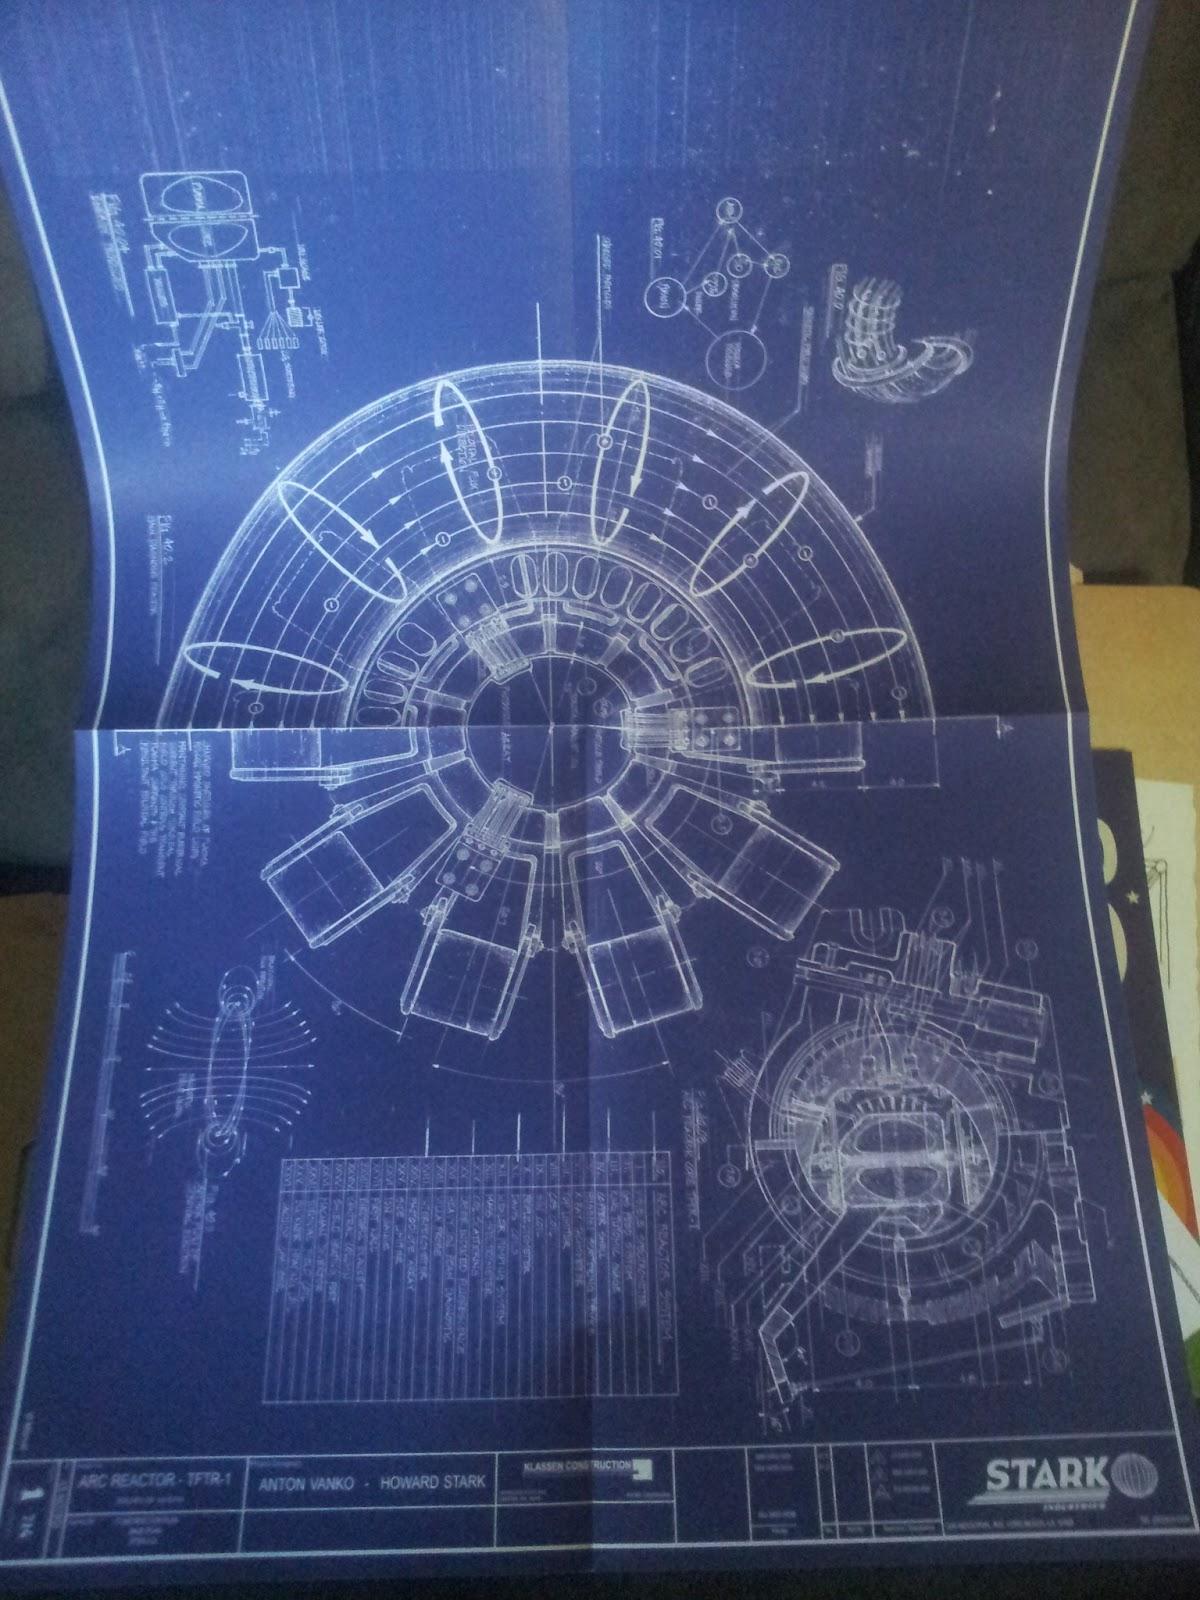 Arc Reactor Schematics - Arcreactorx the intuitive ironman ...